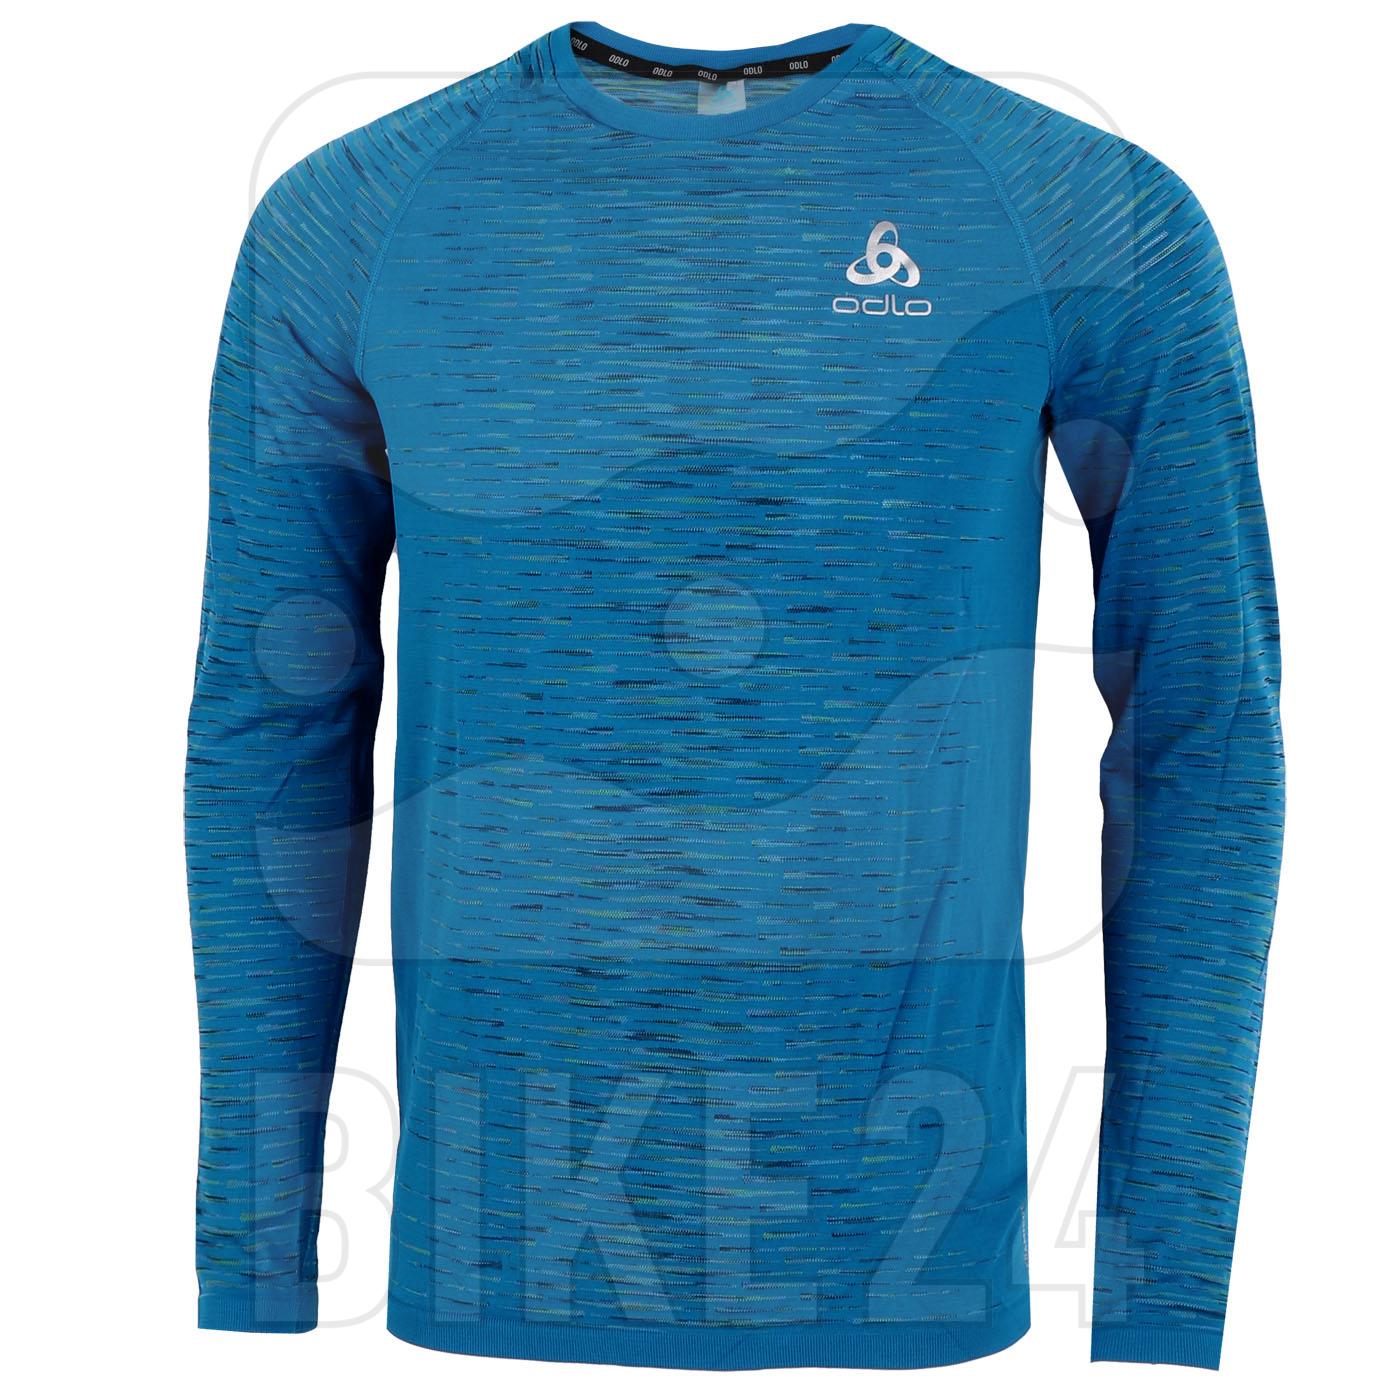 Produktbild von Odlo Herren BLACKCOMB CERAMICOOL Langarmshirt - mykonos blue space dye